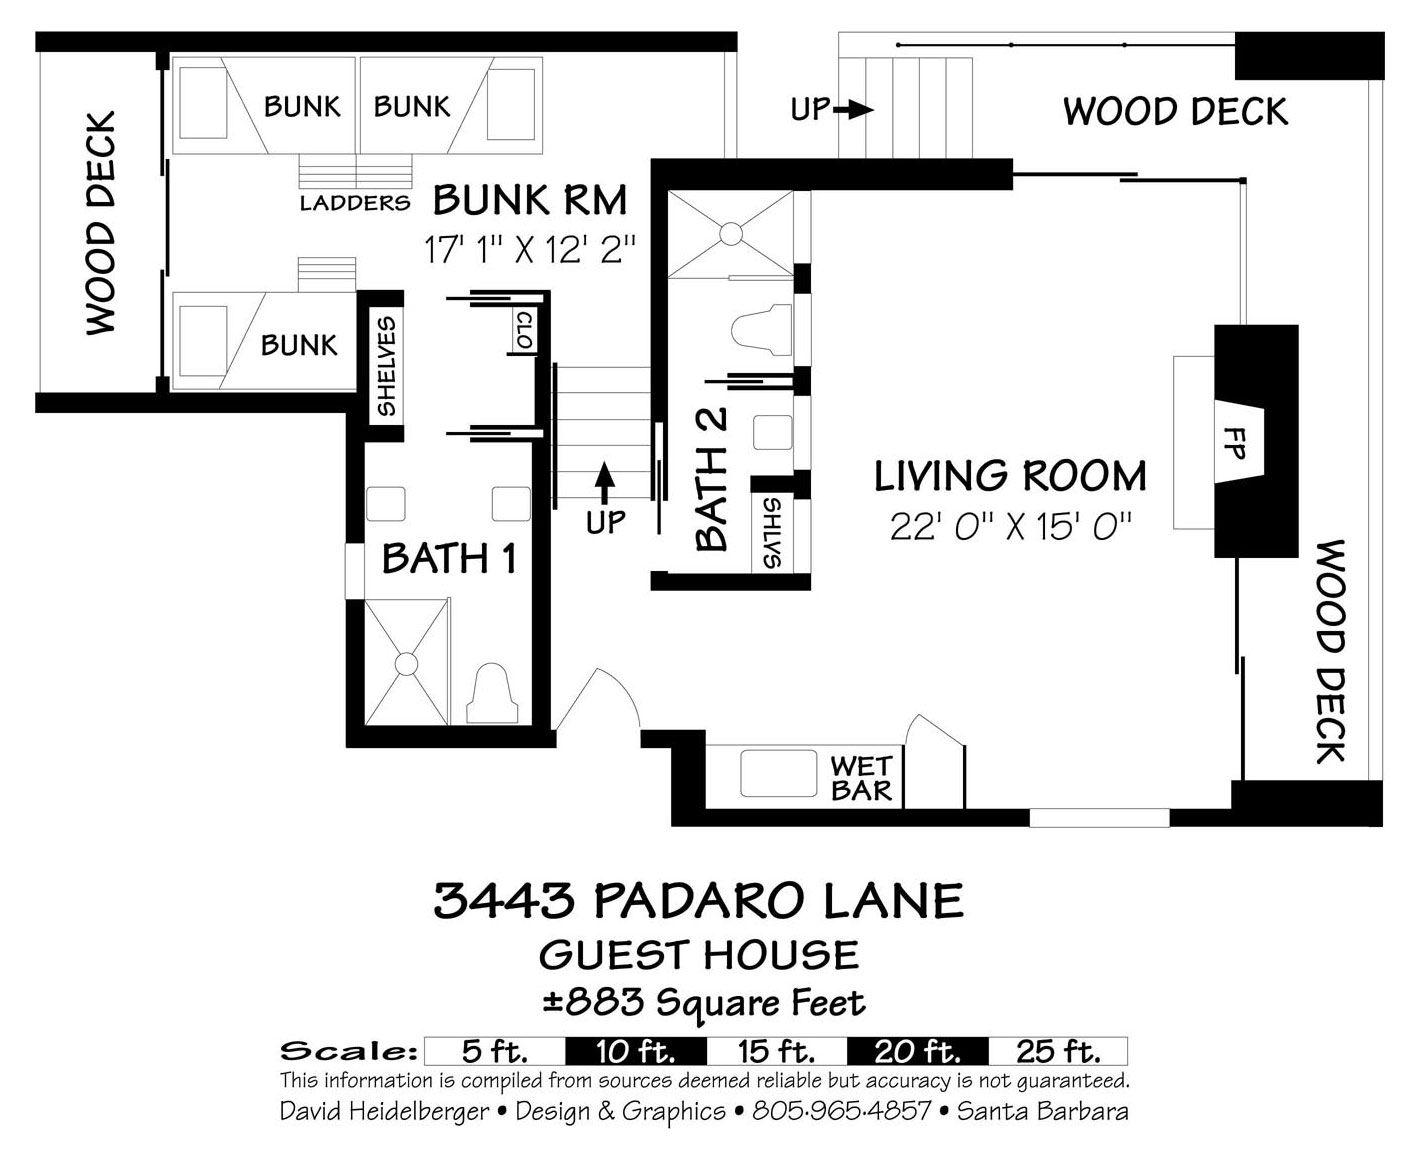 Parado-Lane-House-44